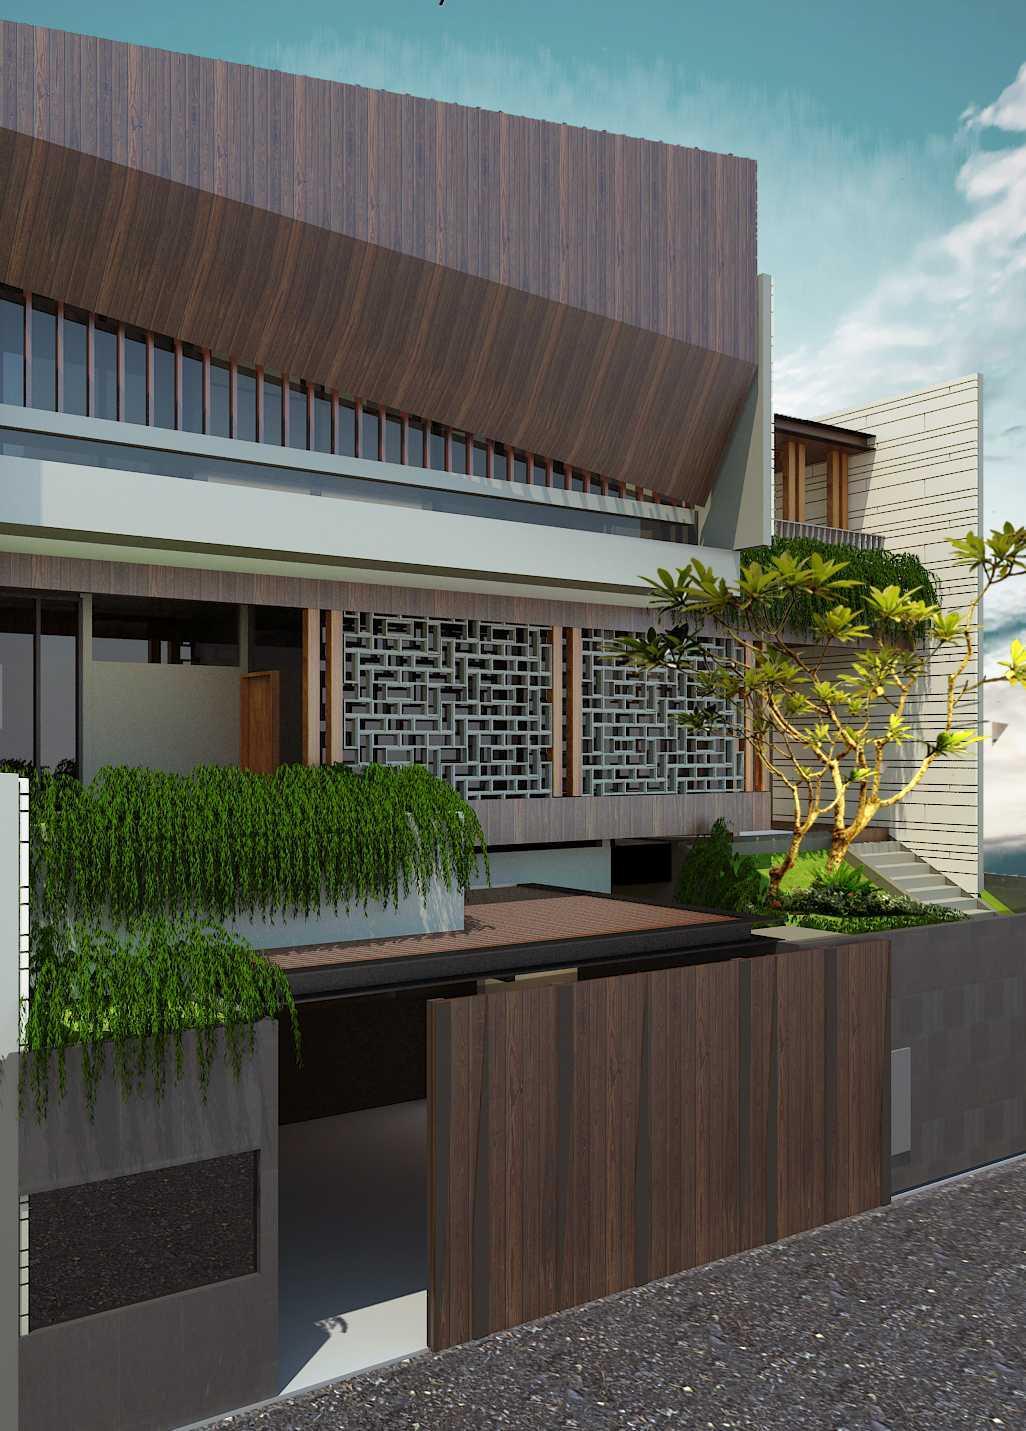 Pt Alradista Desain Indonesia Sa House Bandung City, West Java, Indonesia Bandung City, West Java, Indonesia Exterior View Modern 30734